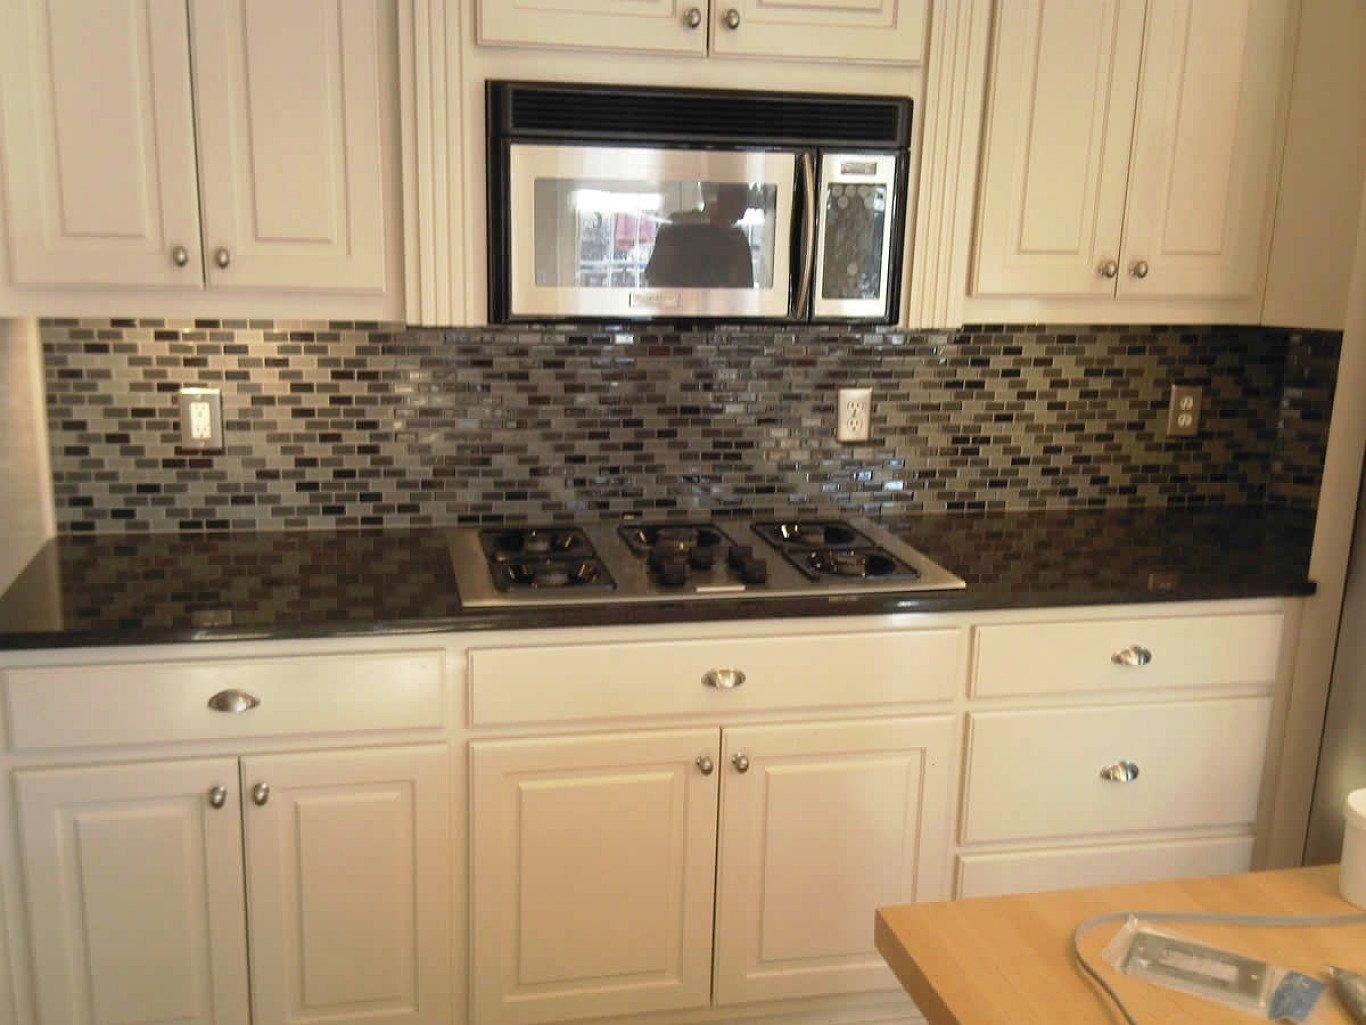 10 Stunning Backsplash Ideas For Kitchens Inexpensive backsplash designs for small kitcheneas formidable kitchens cheap 2021